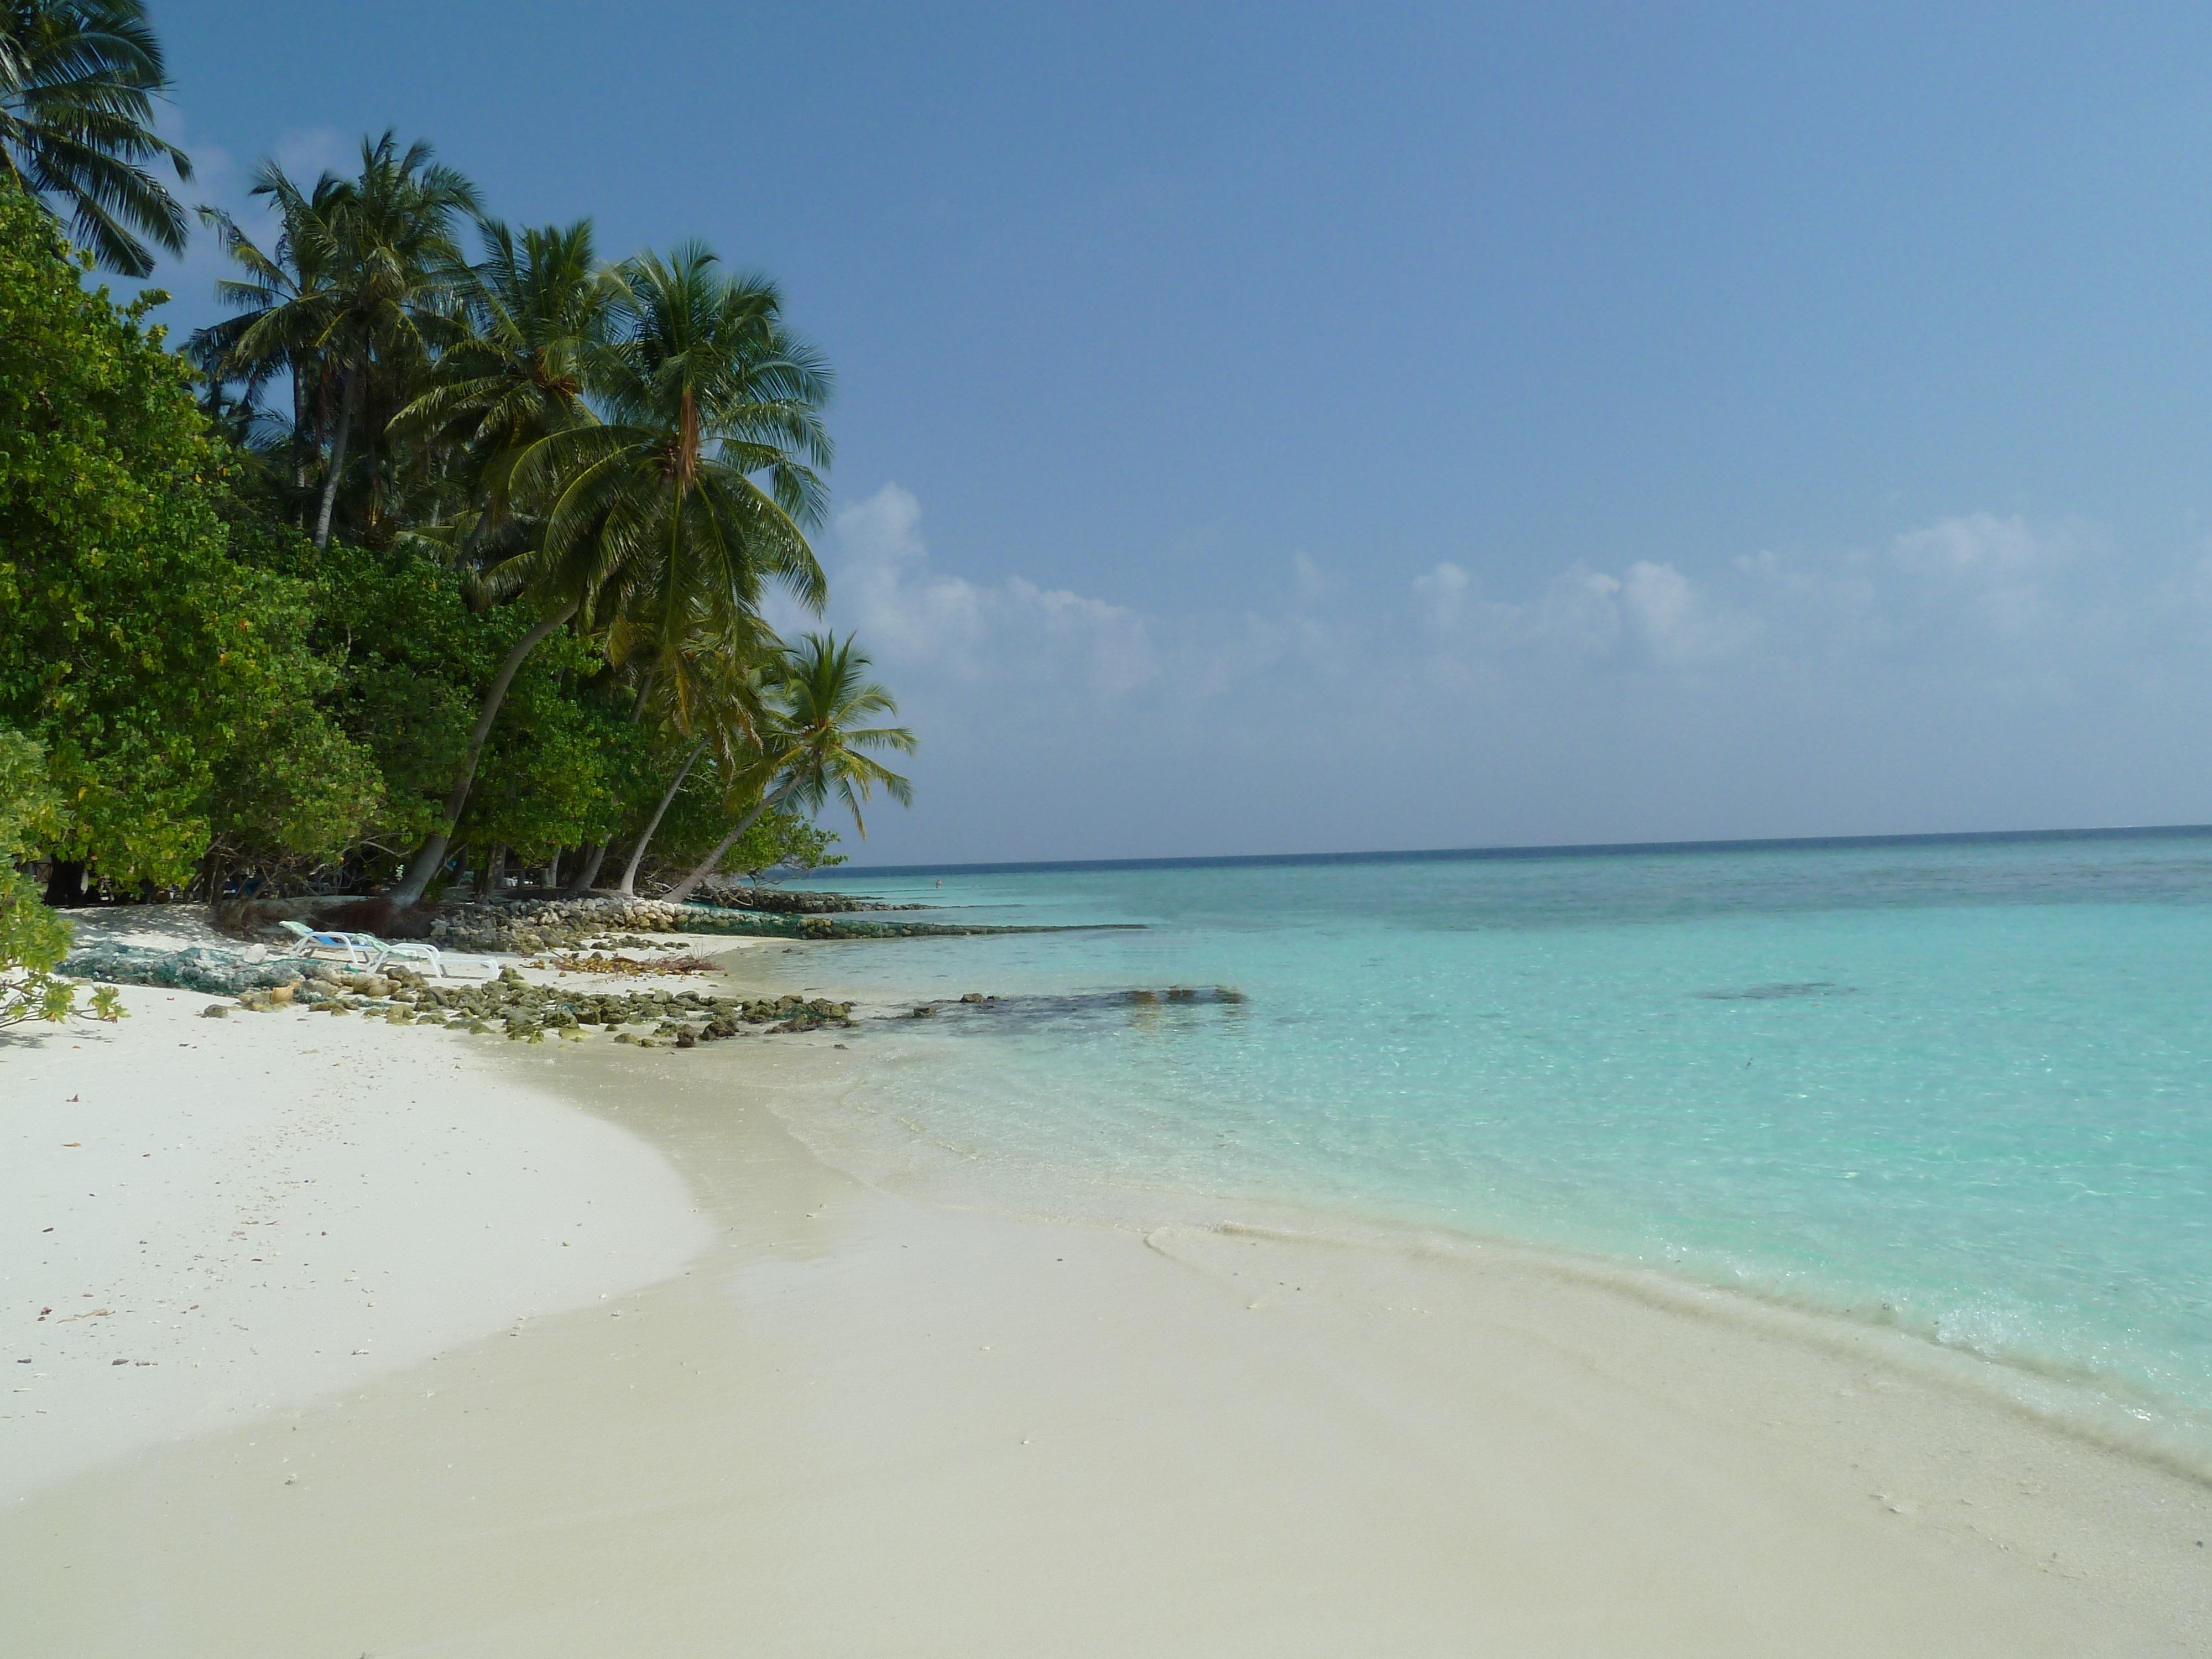 картинки карибский пляж близких